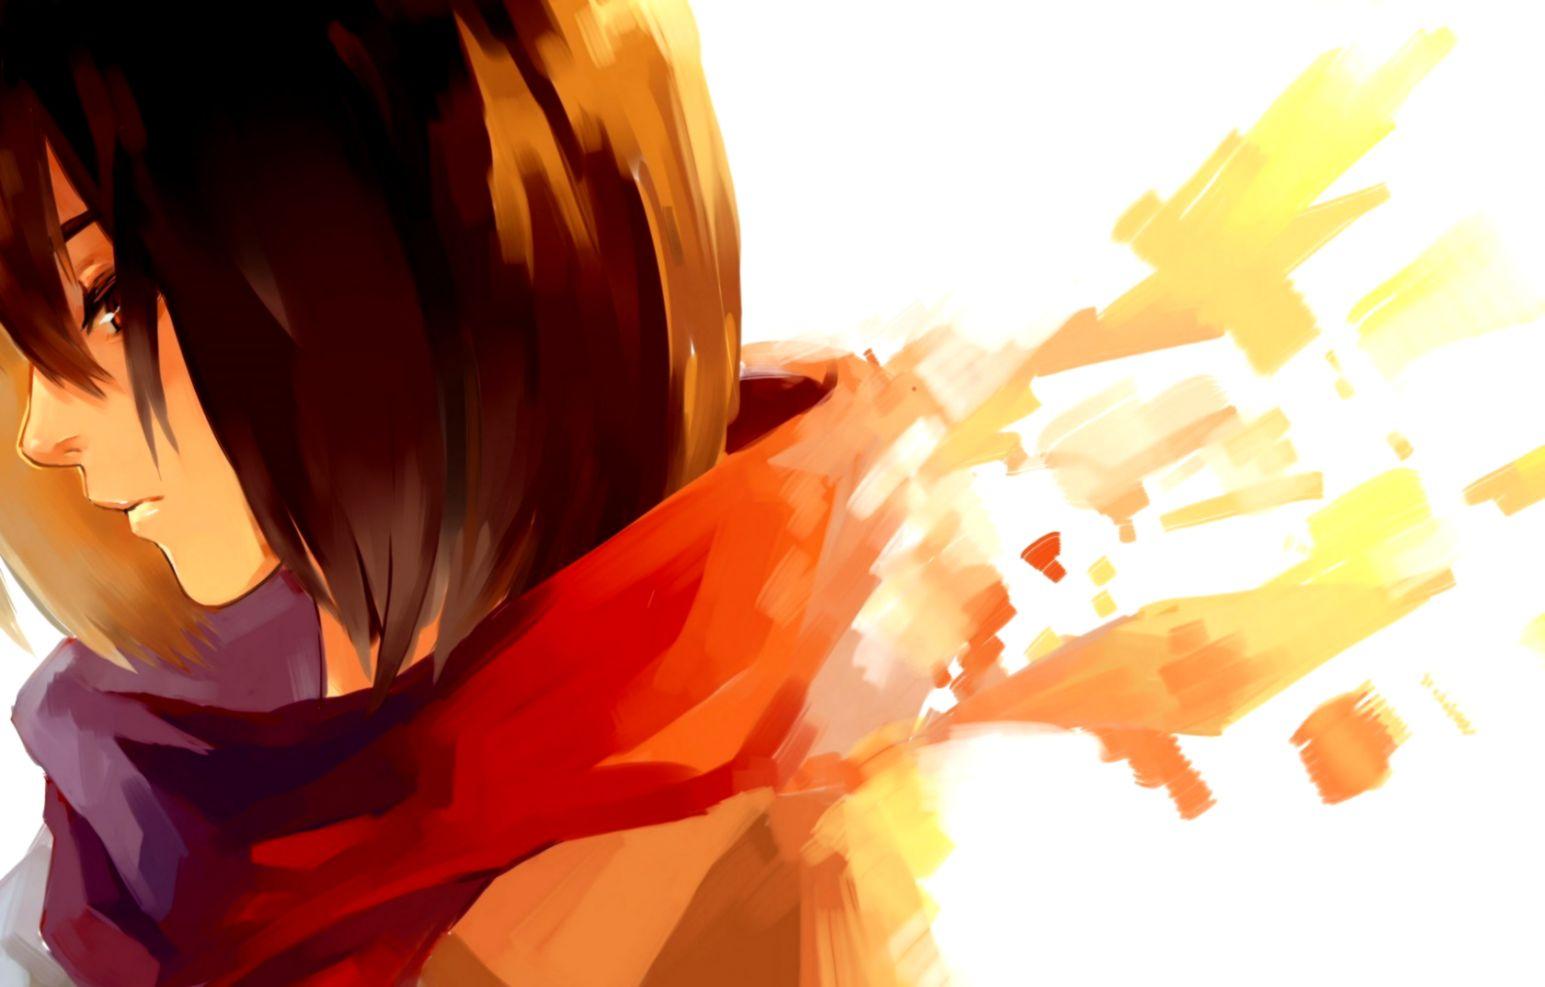 Wonder woman art abyss